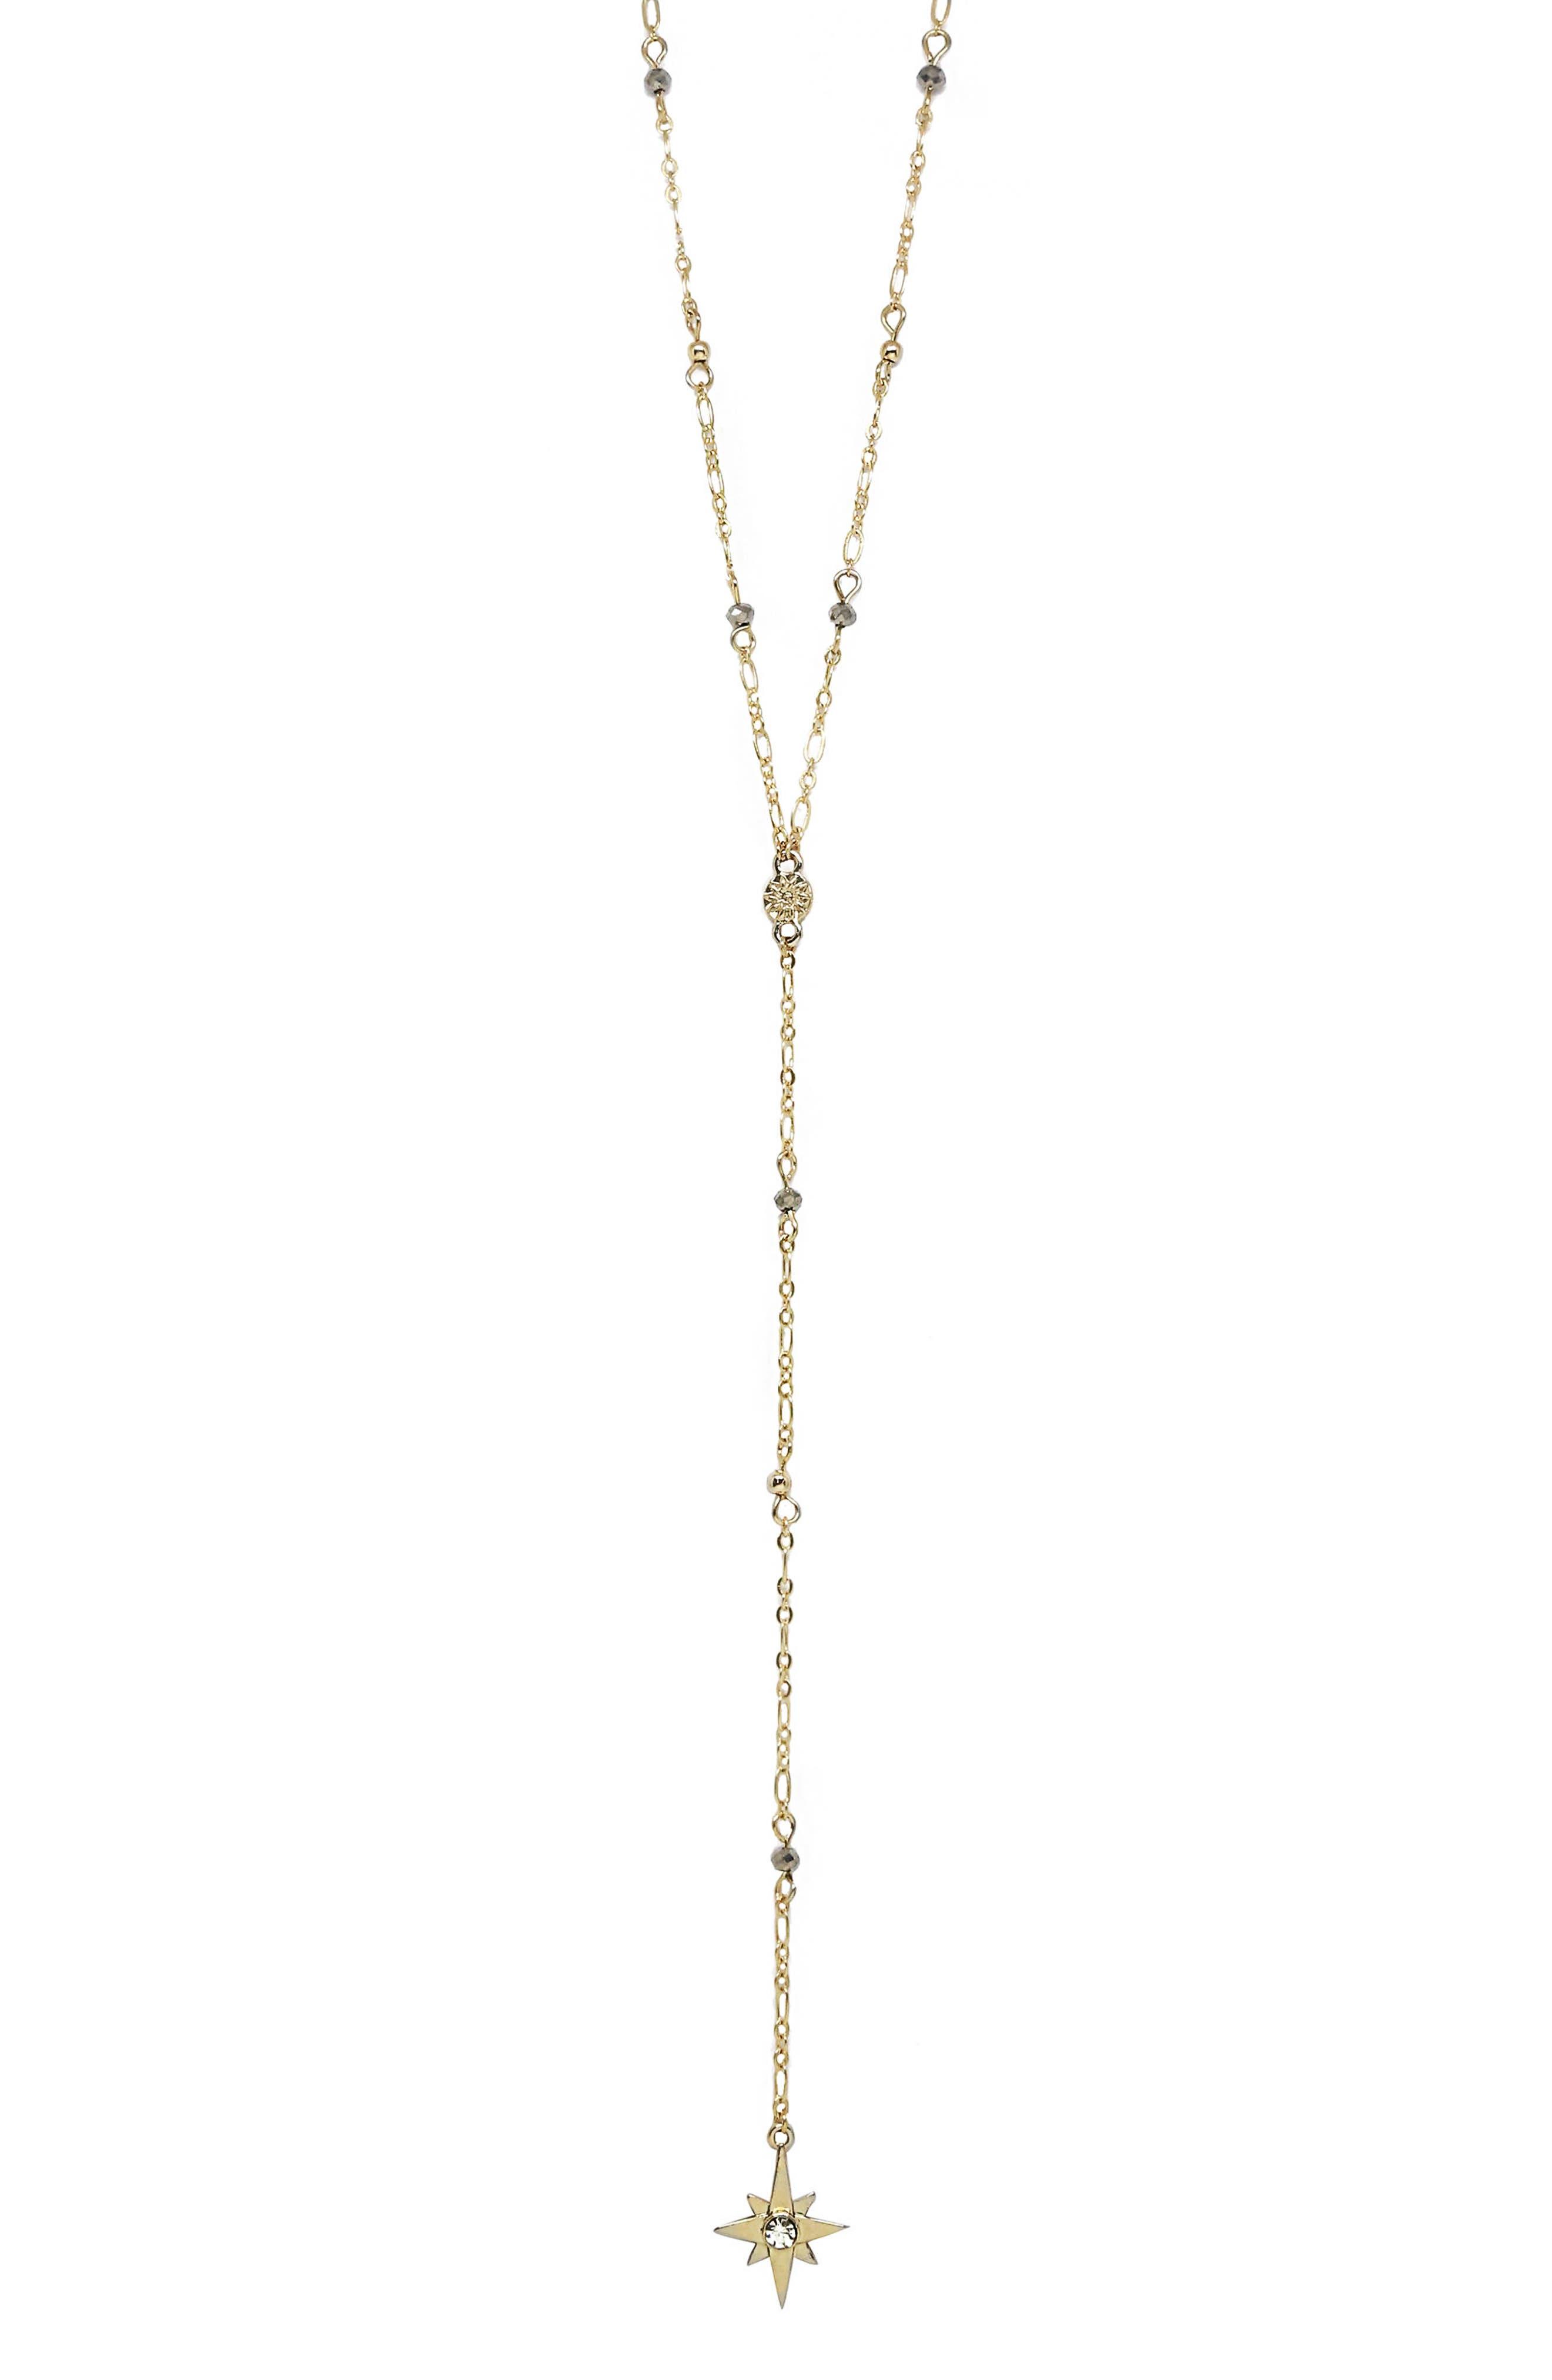 Chain Lariat Necklace,                             Main thumbnail 1, color,                             710